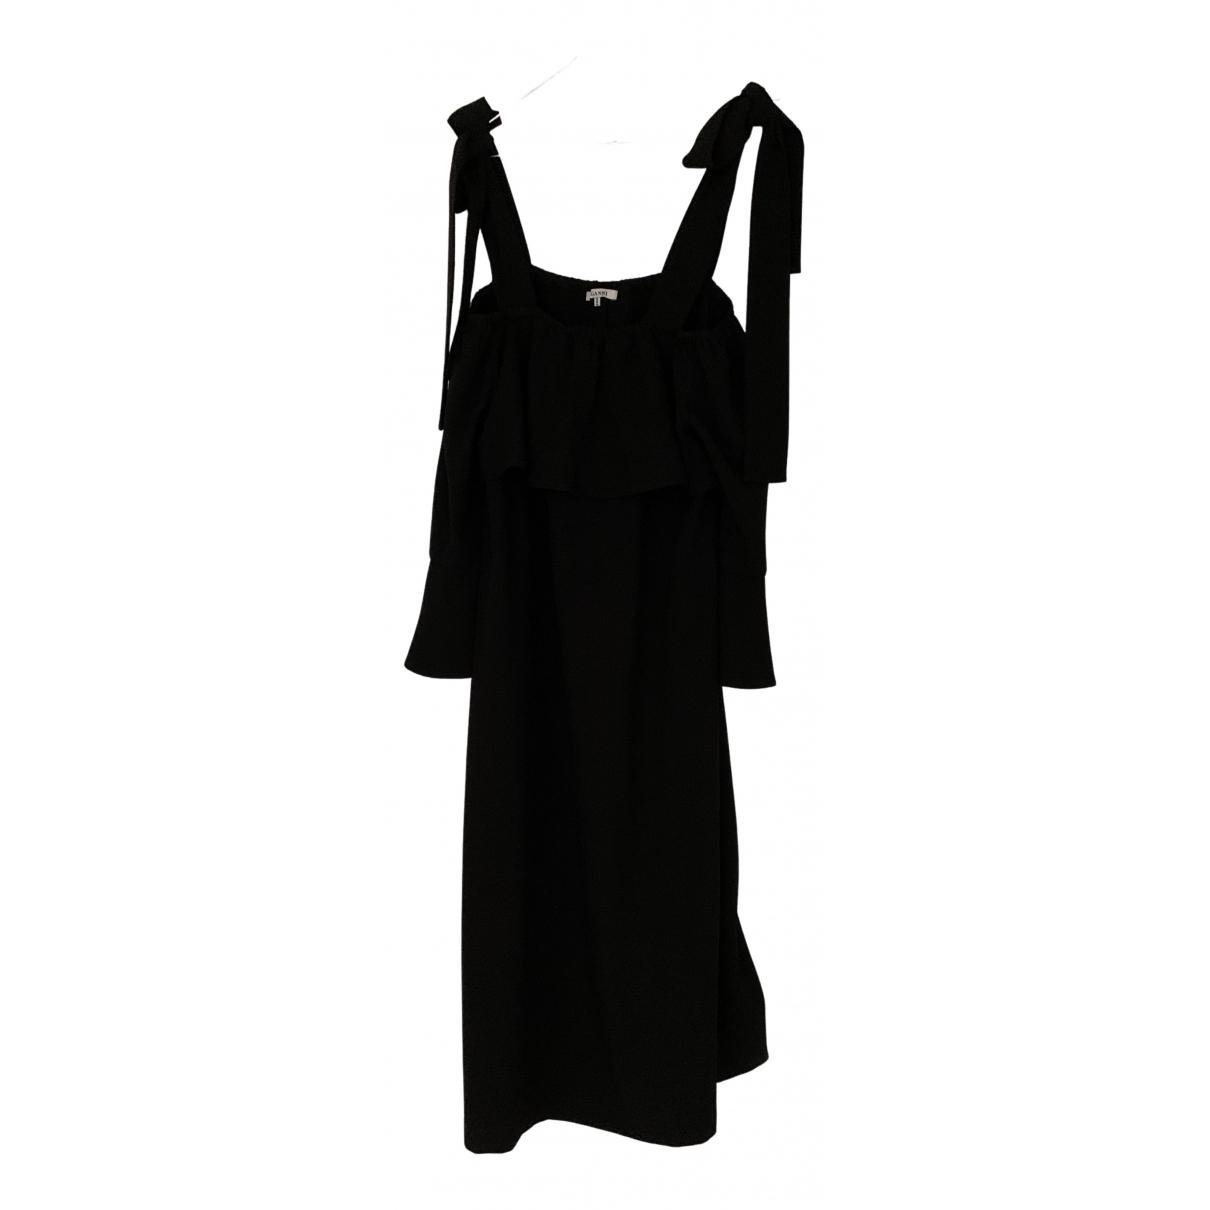 Ganni N Black dress for Women 36 FR